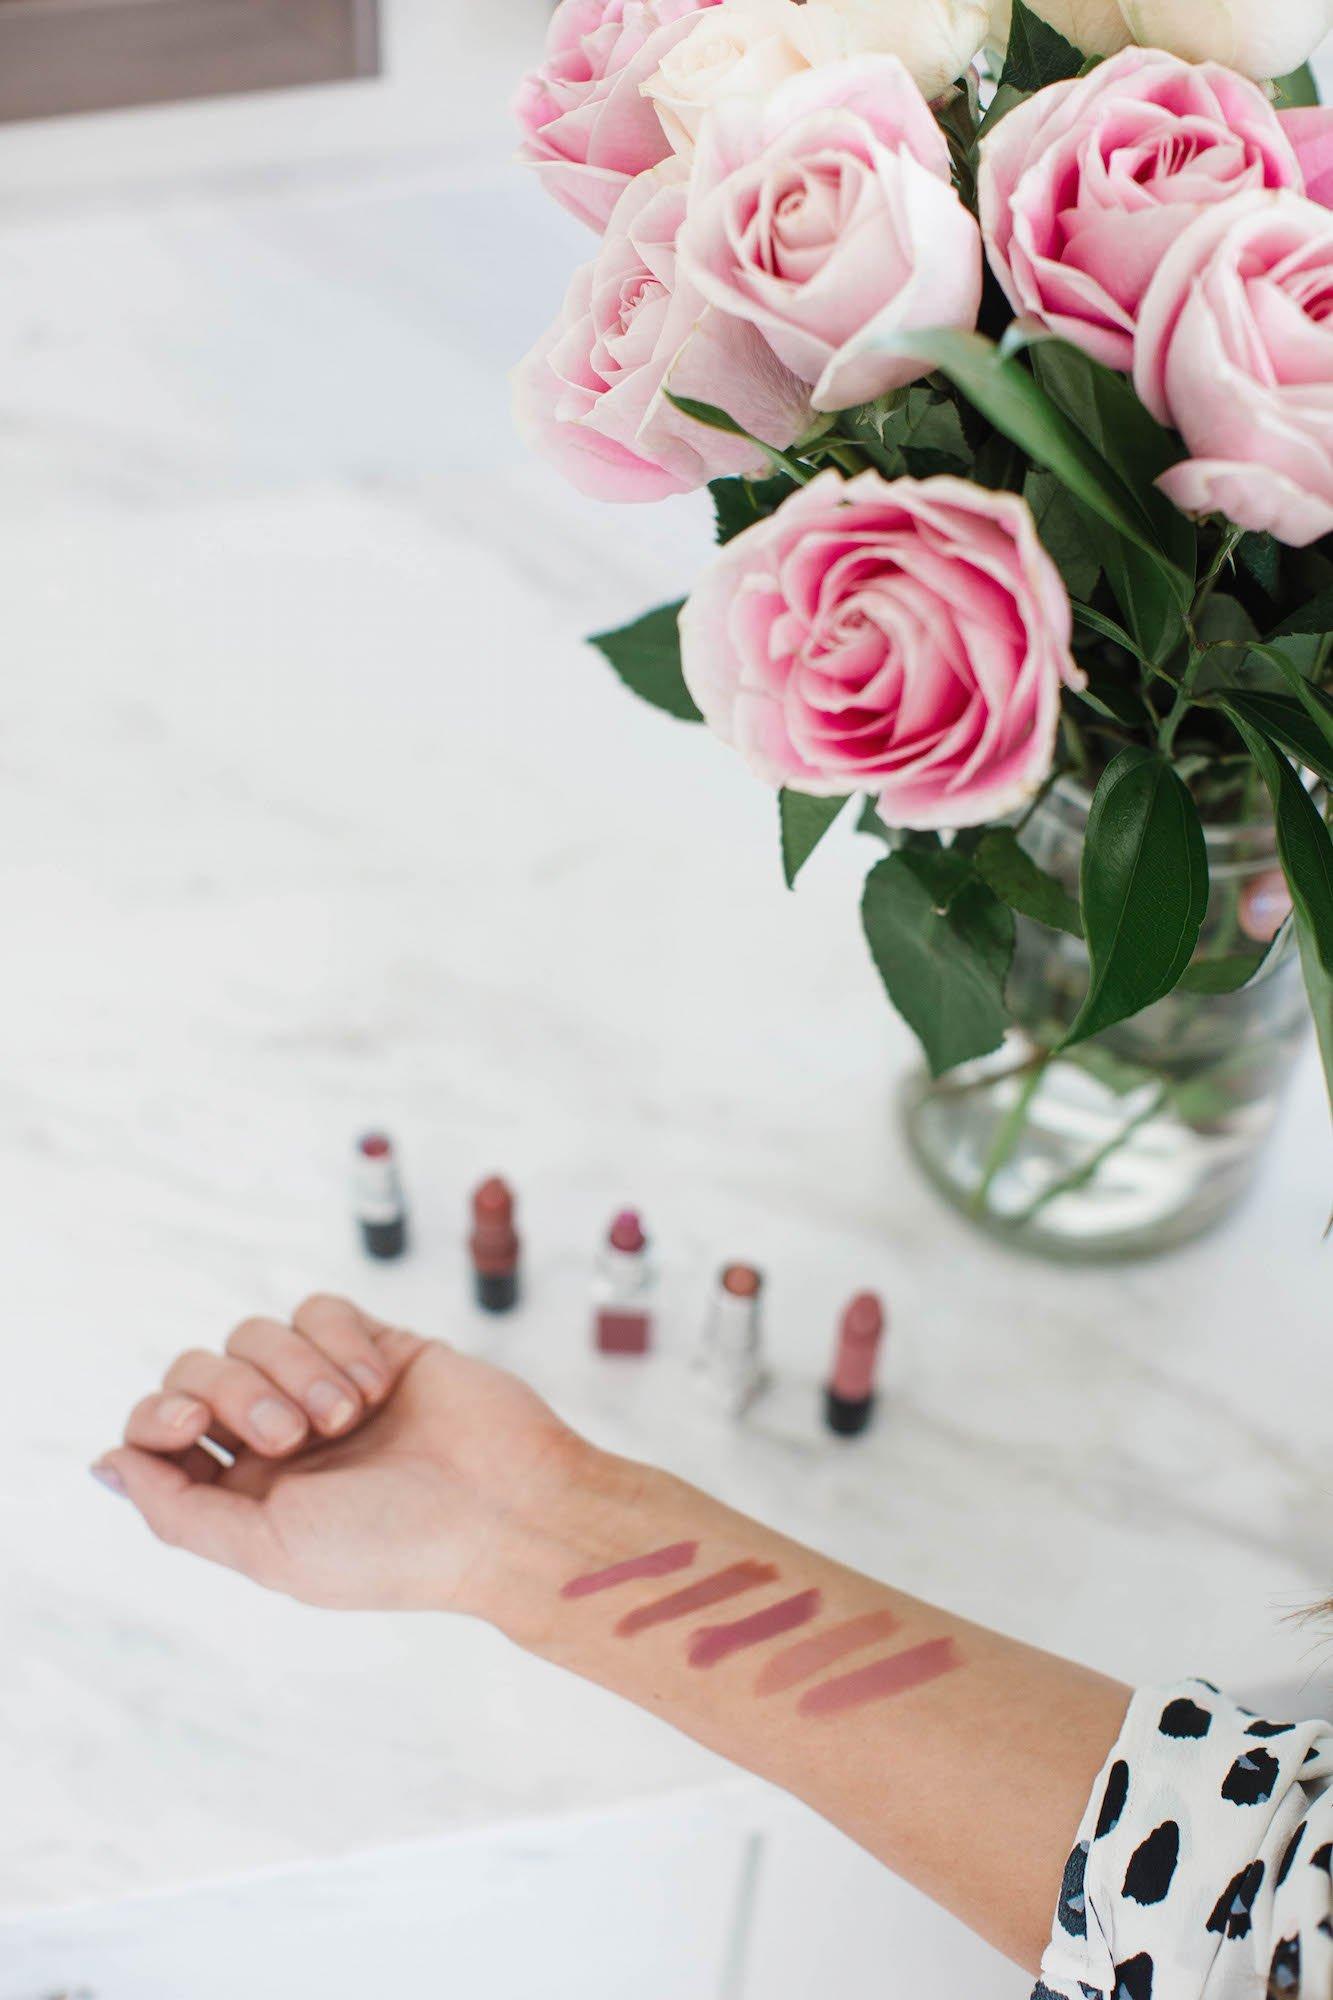 Merrick's Art Neutral Lipstick Colors